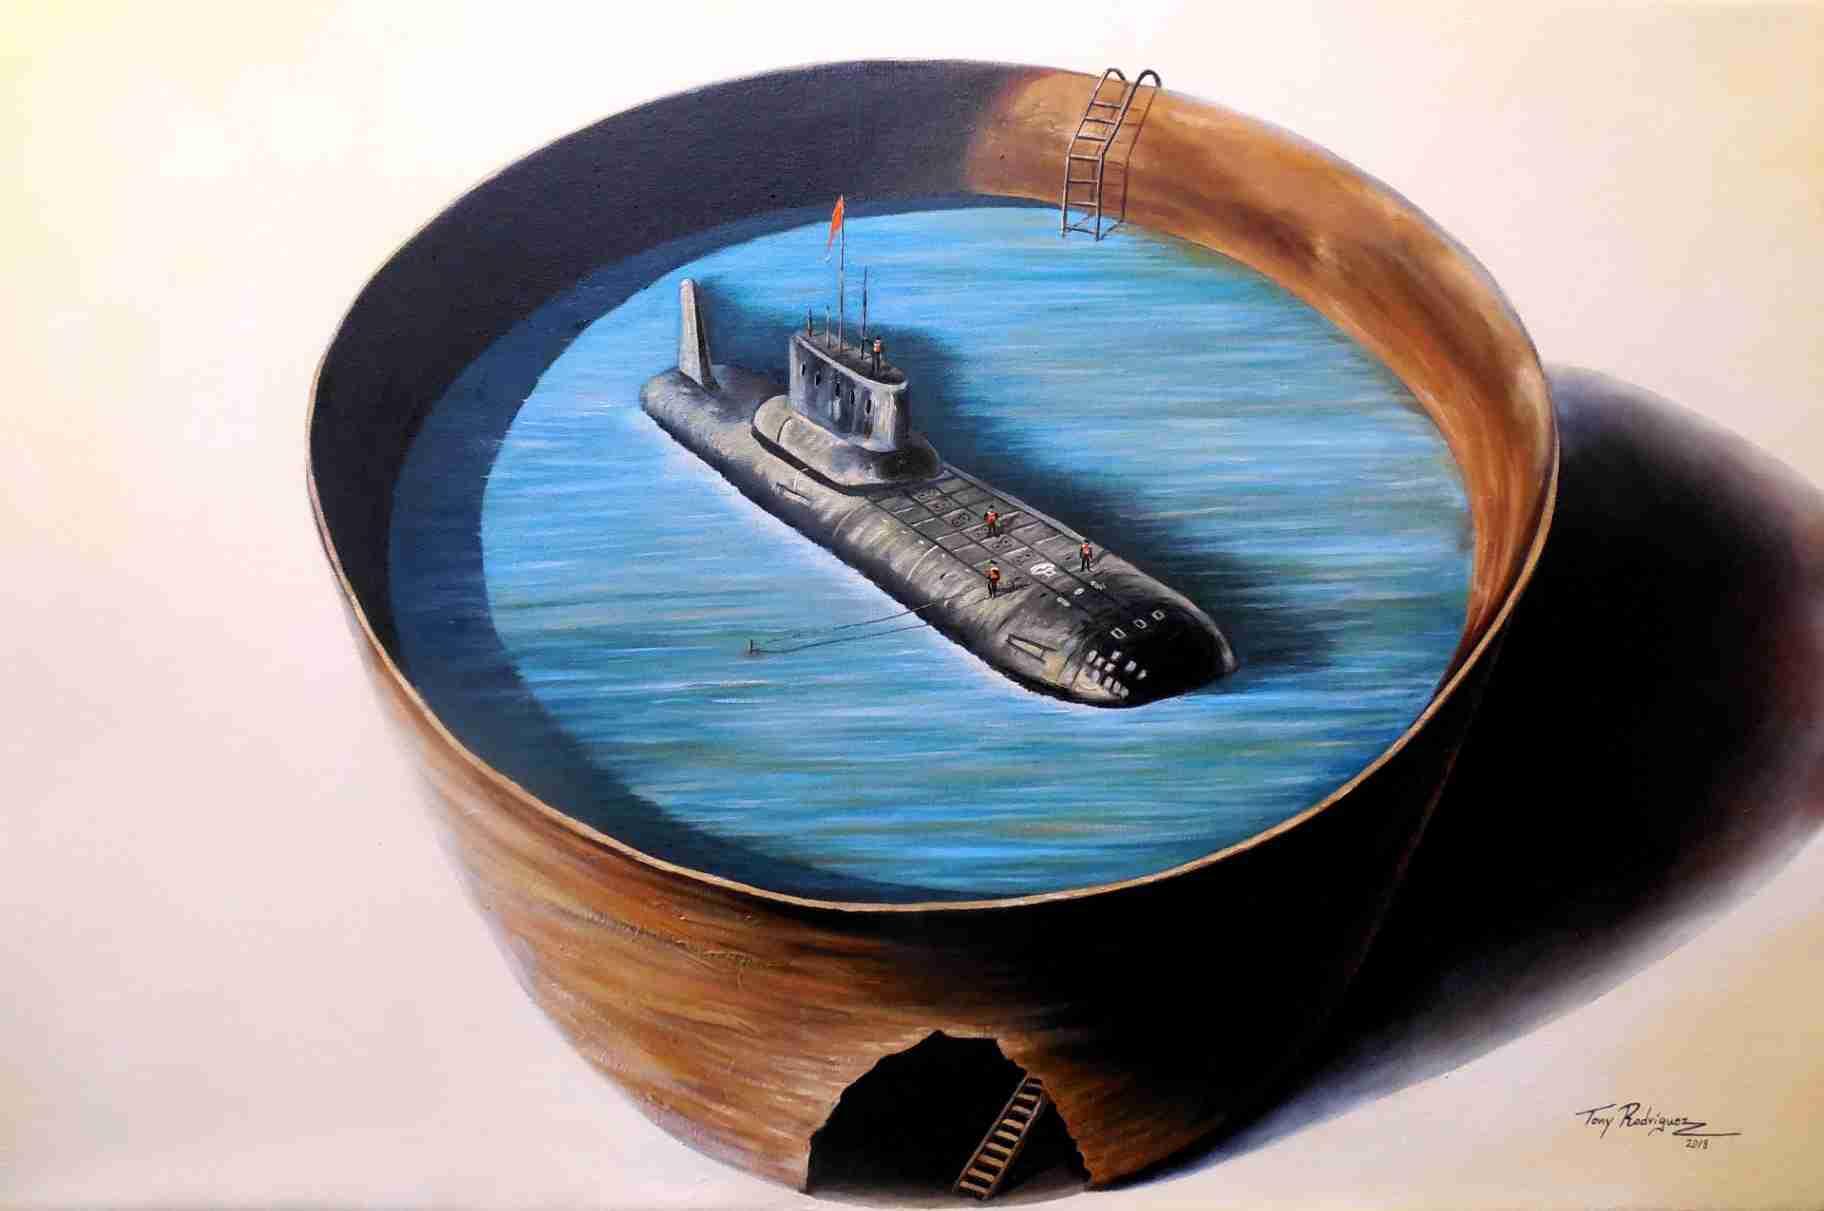 Obra: De la serie Crónicas del agua(Nautilus)